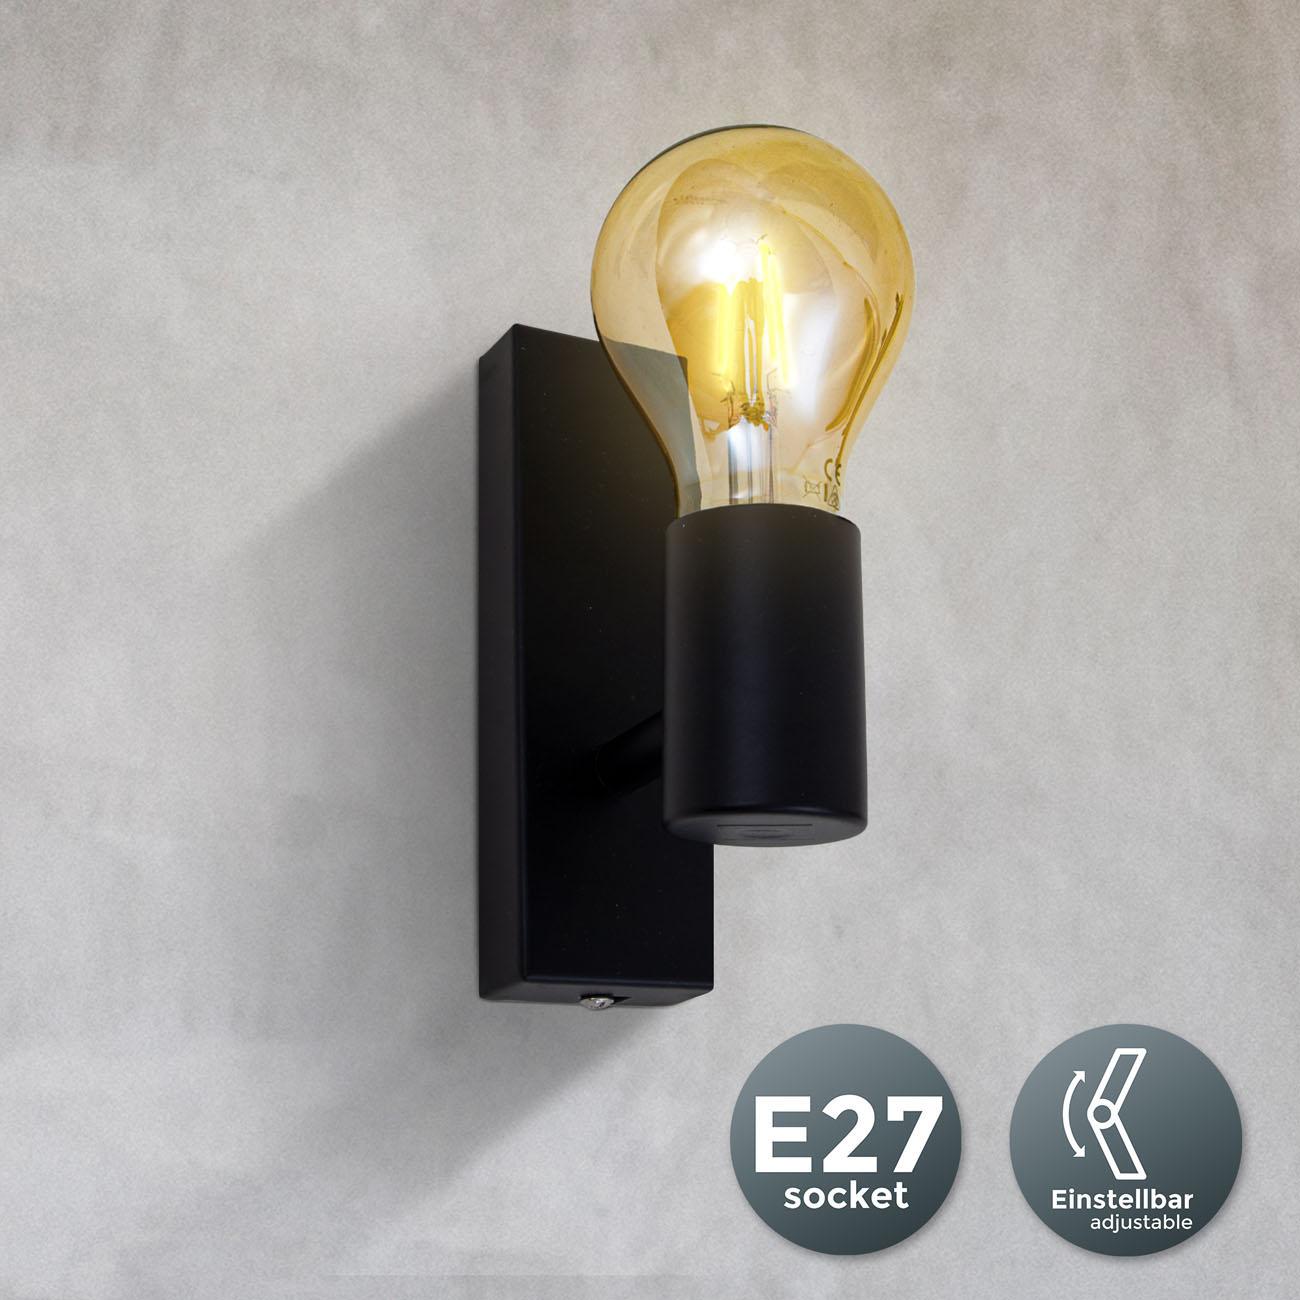 Vintage Wandleuchte schwarz E27 - 3